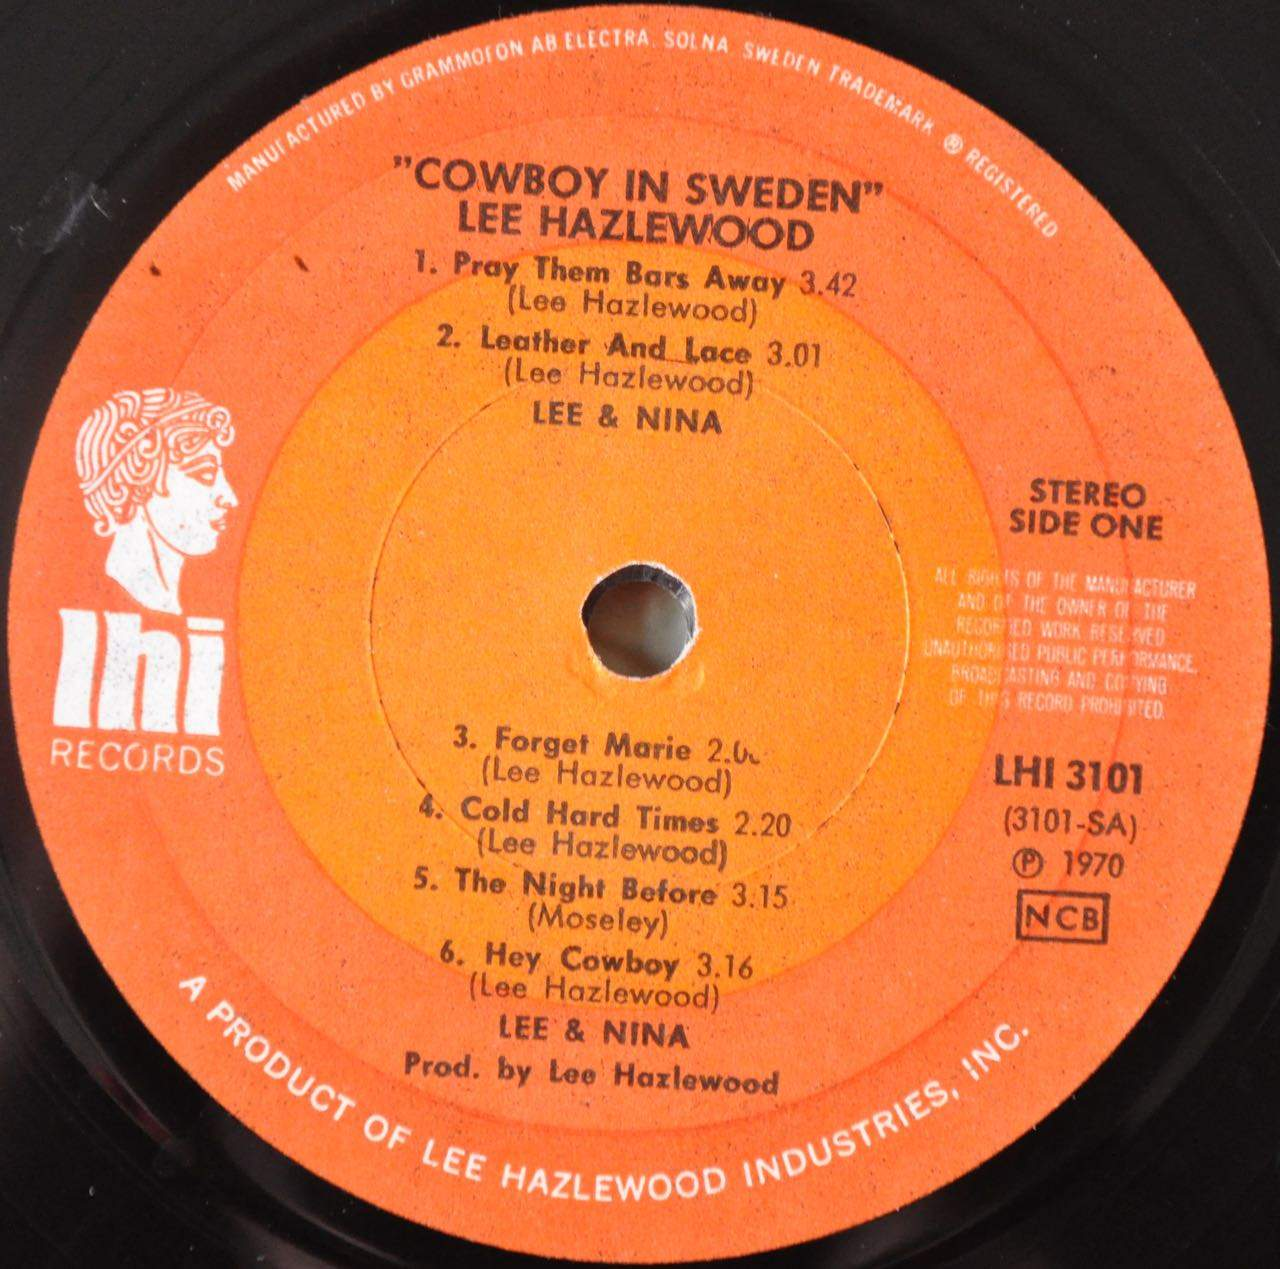 Lee Hazlewood Cowboy In Sweden